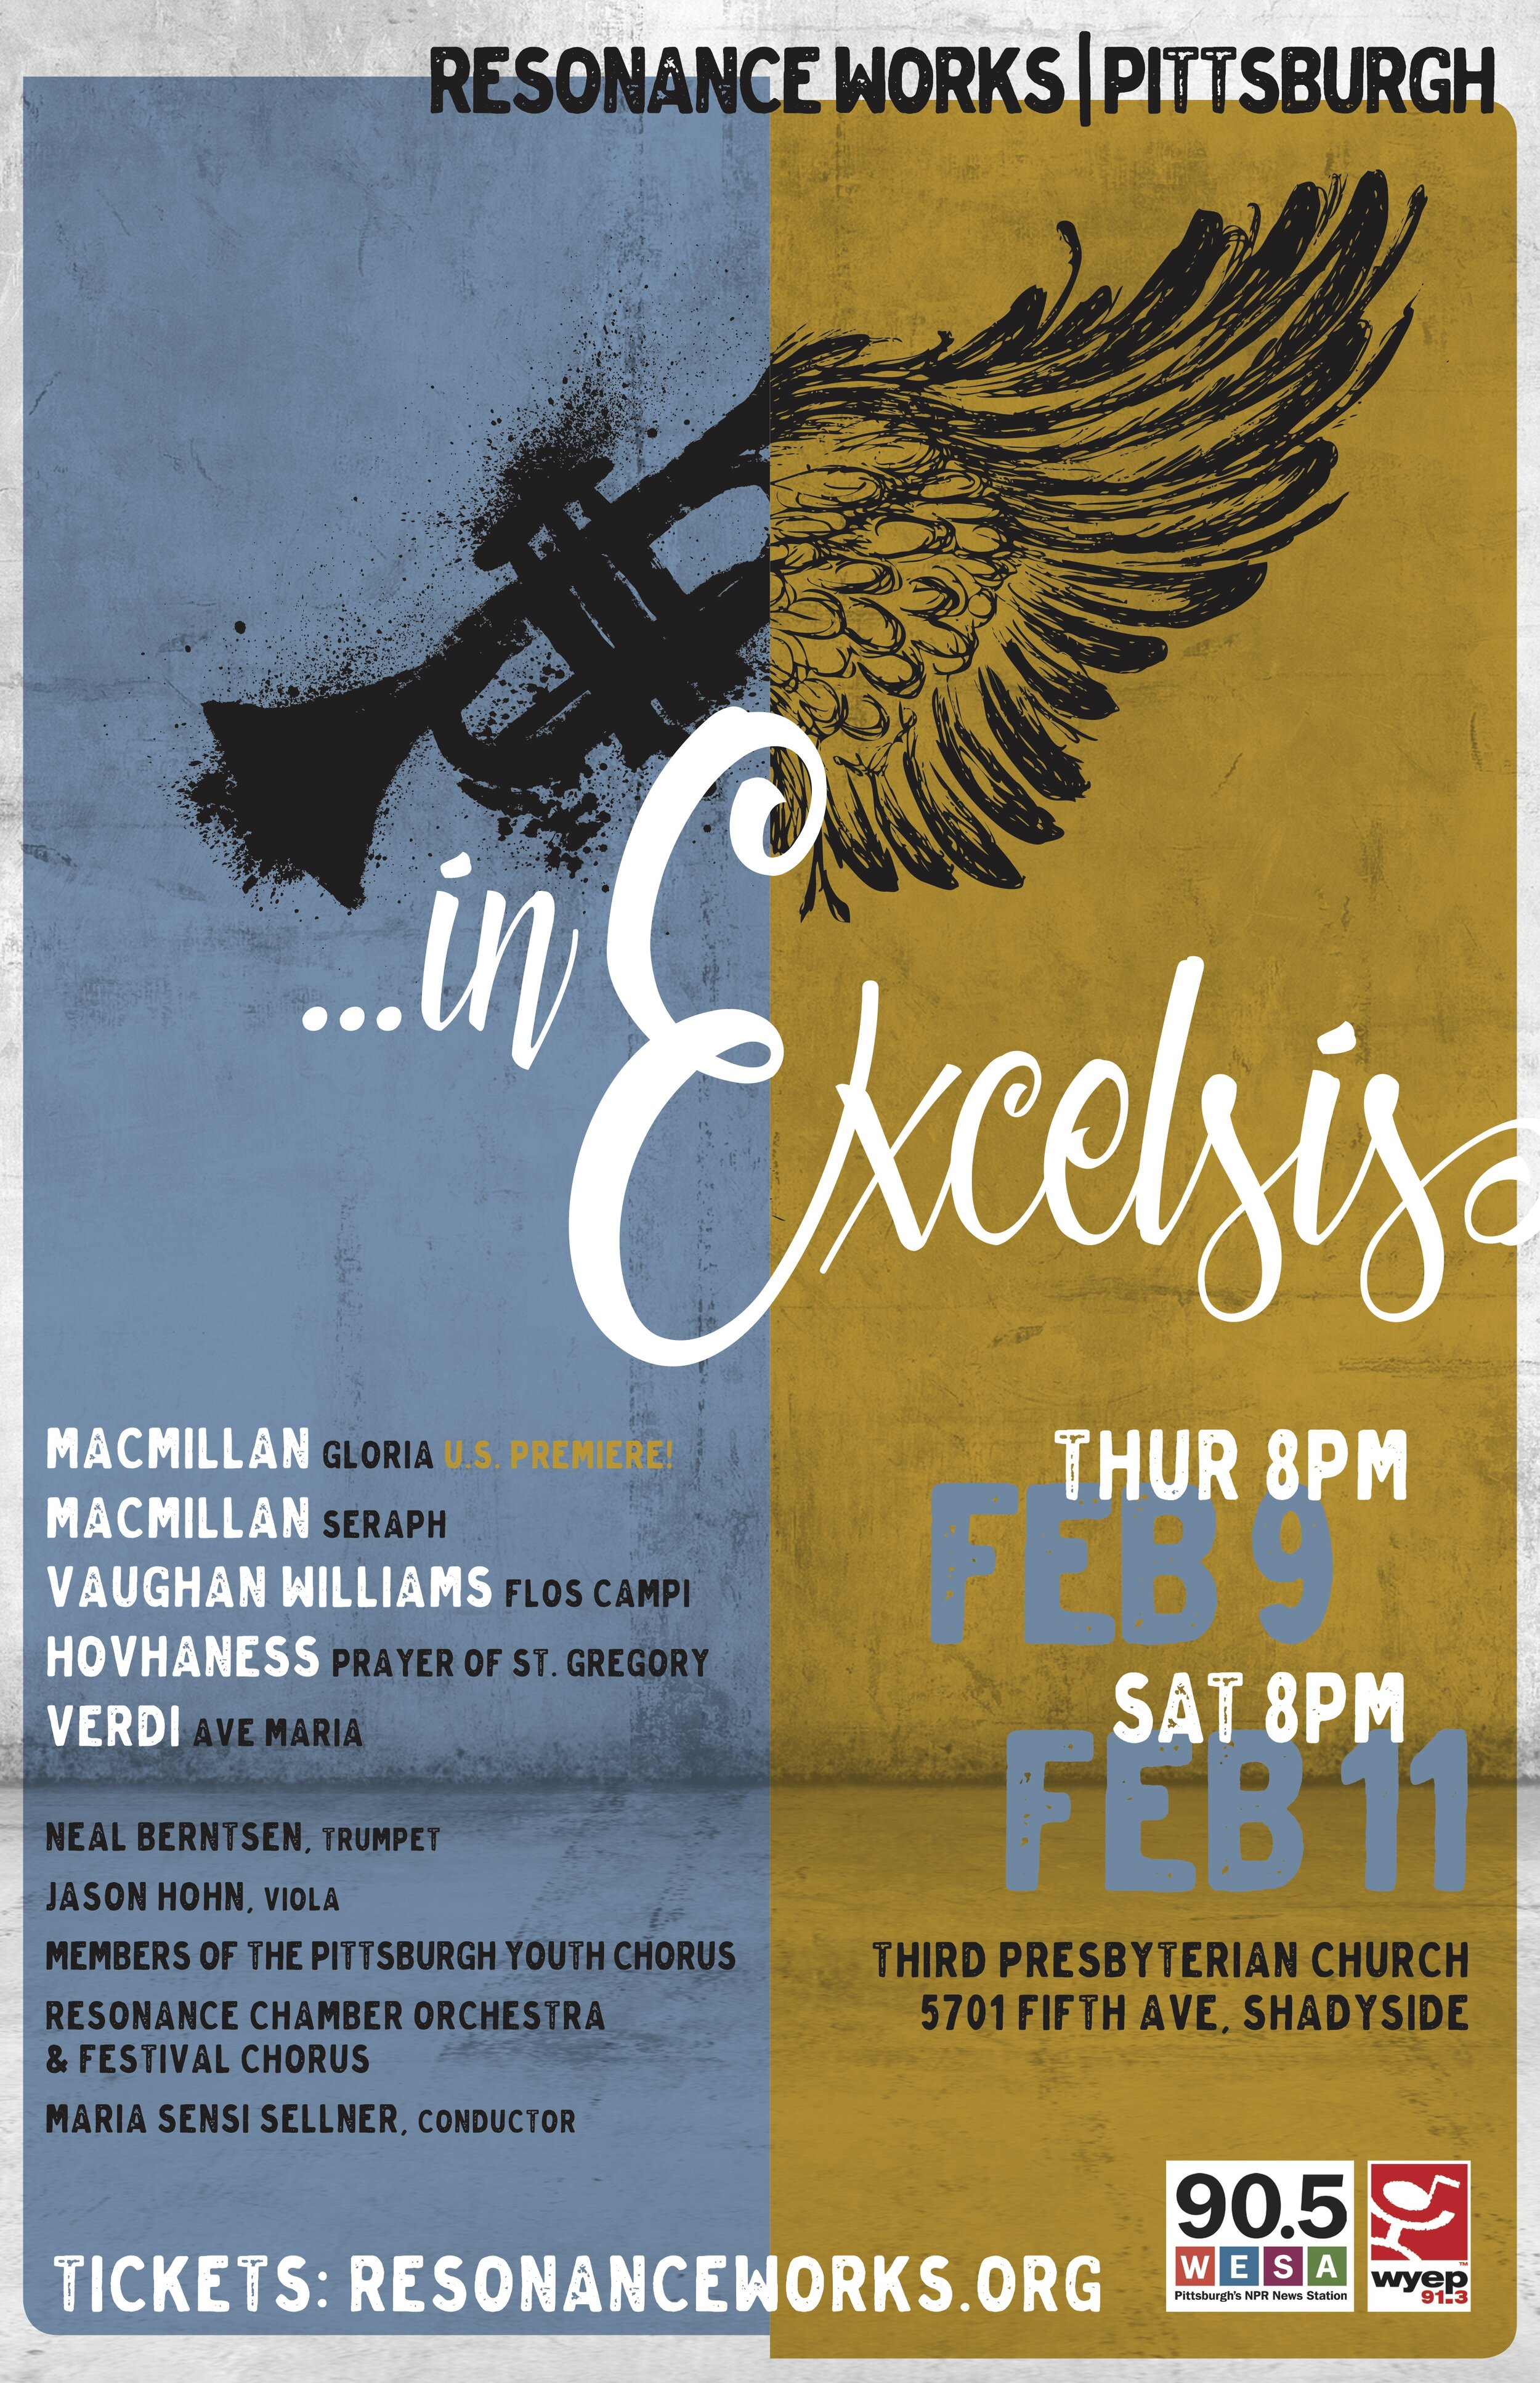 RW15 Excelsis_Poster v3.jpg